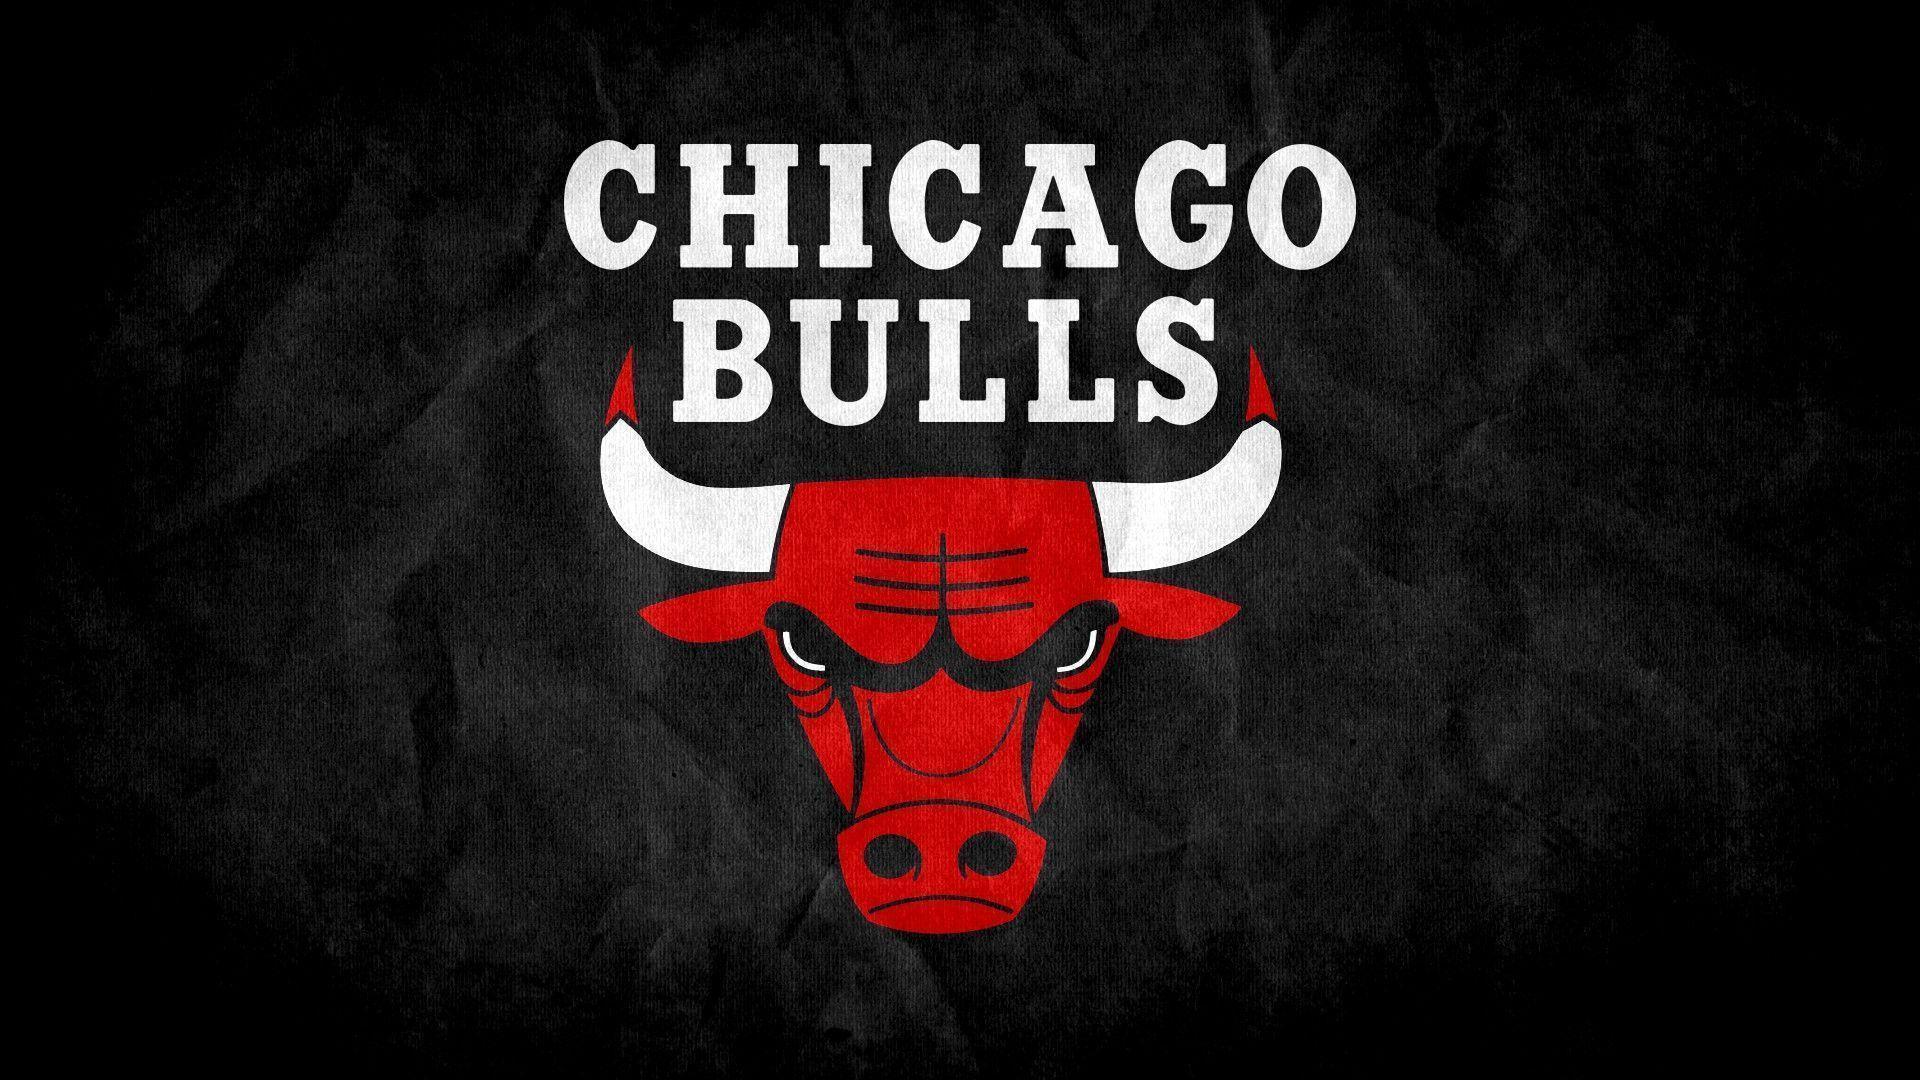 Chicago Bulls Wallpapers HD 2015 1920x1080